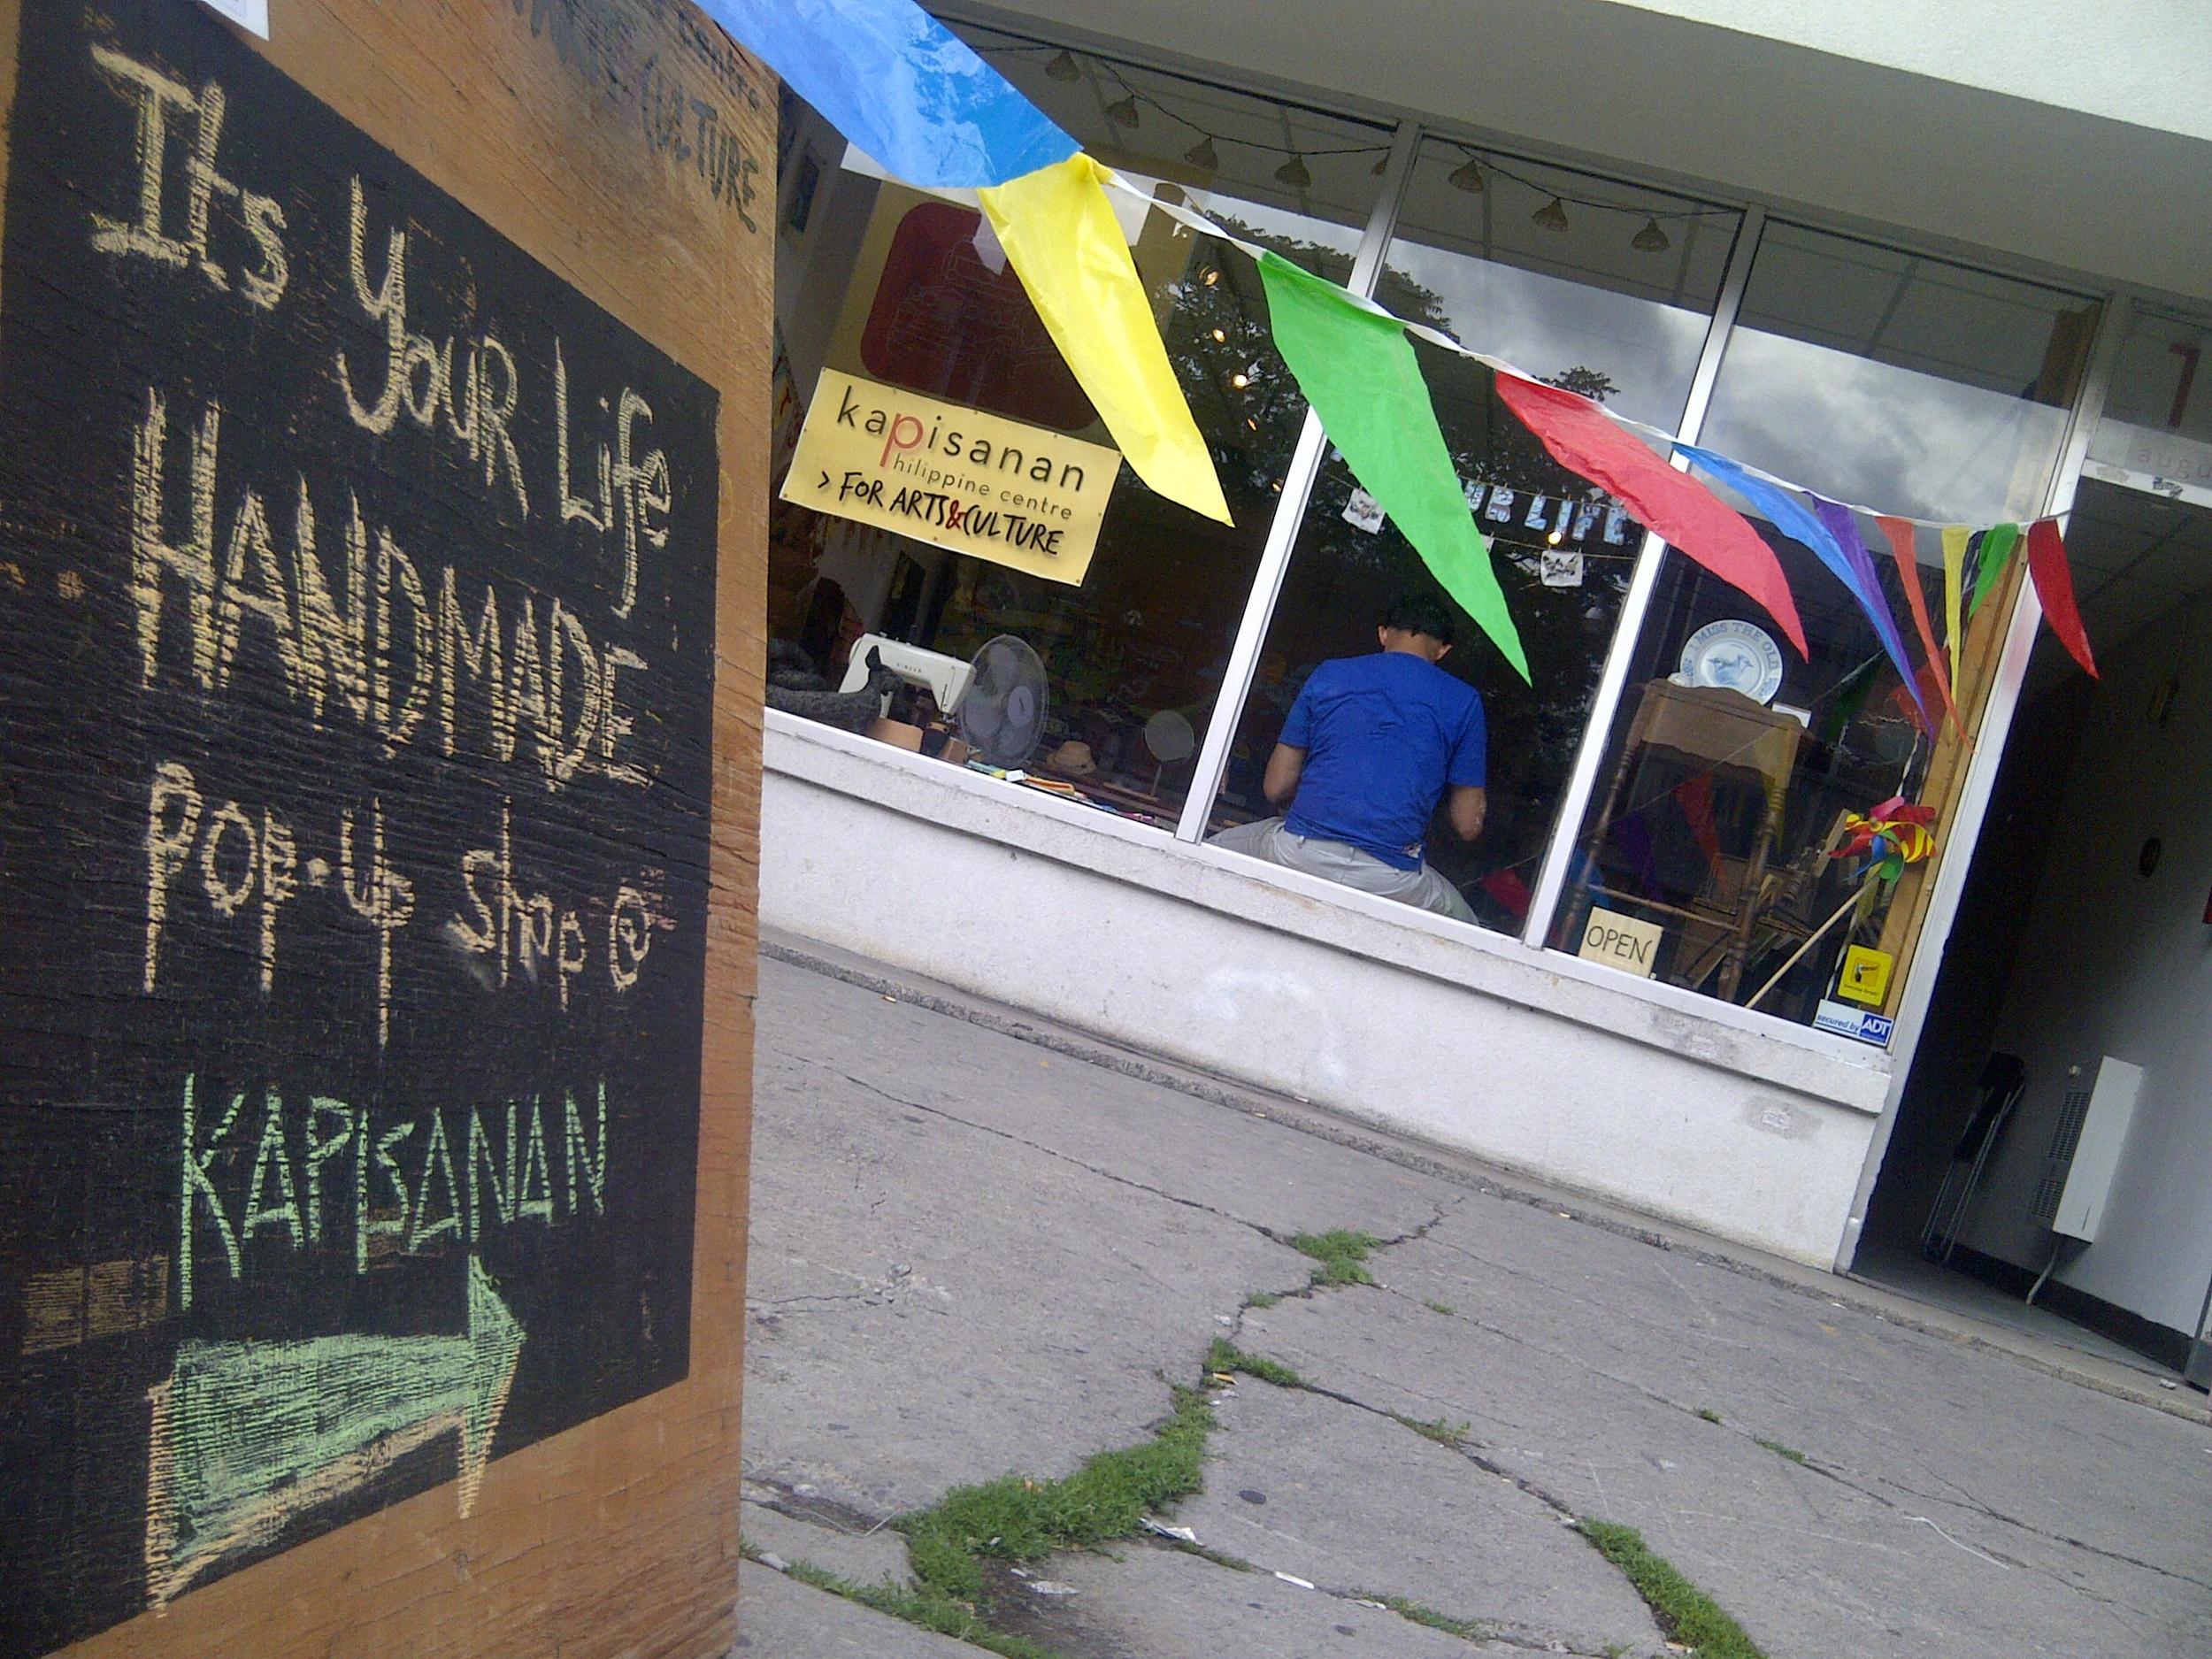 image of kapisanan/its your life handmade storefront, with banderitas